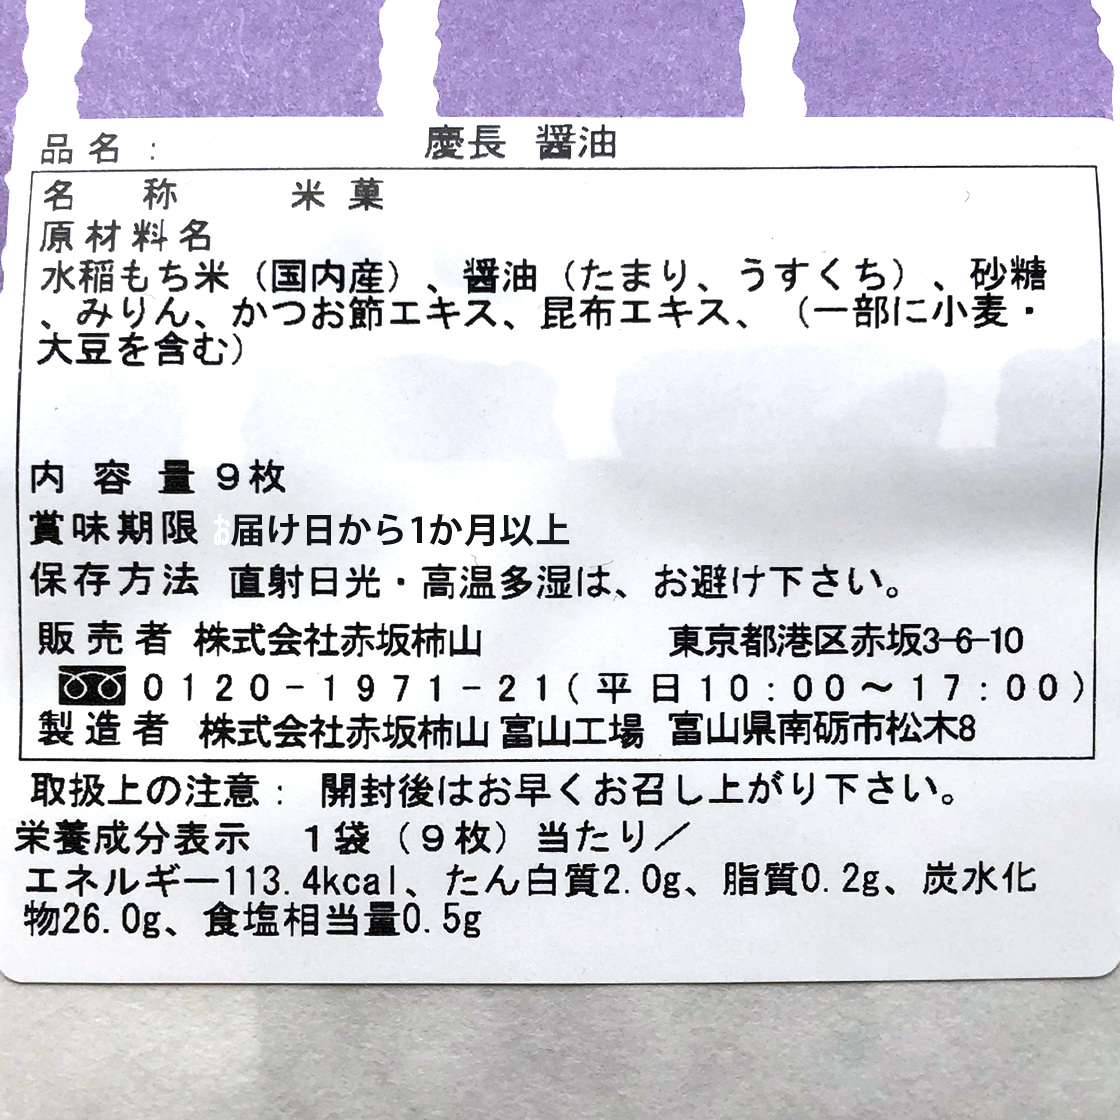 立ち袋/3種類[赤坂柿山] 25